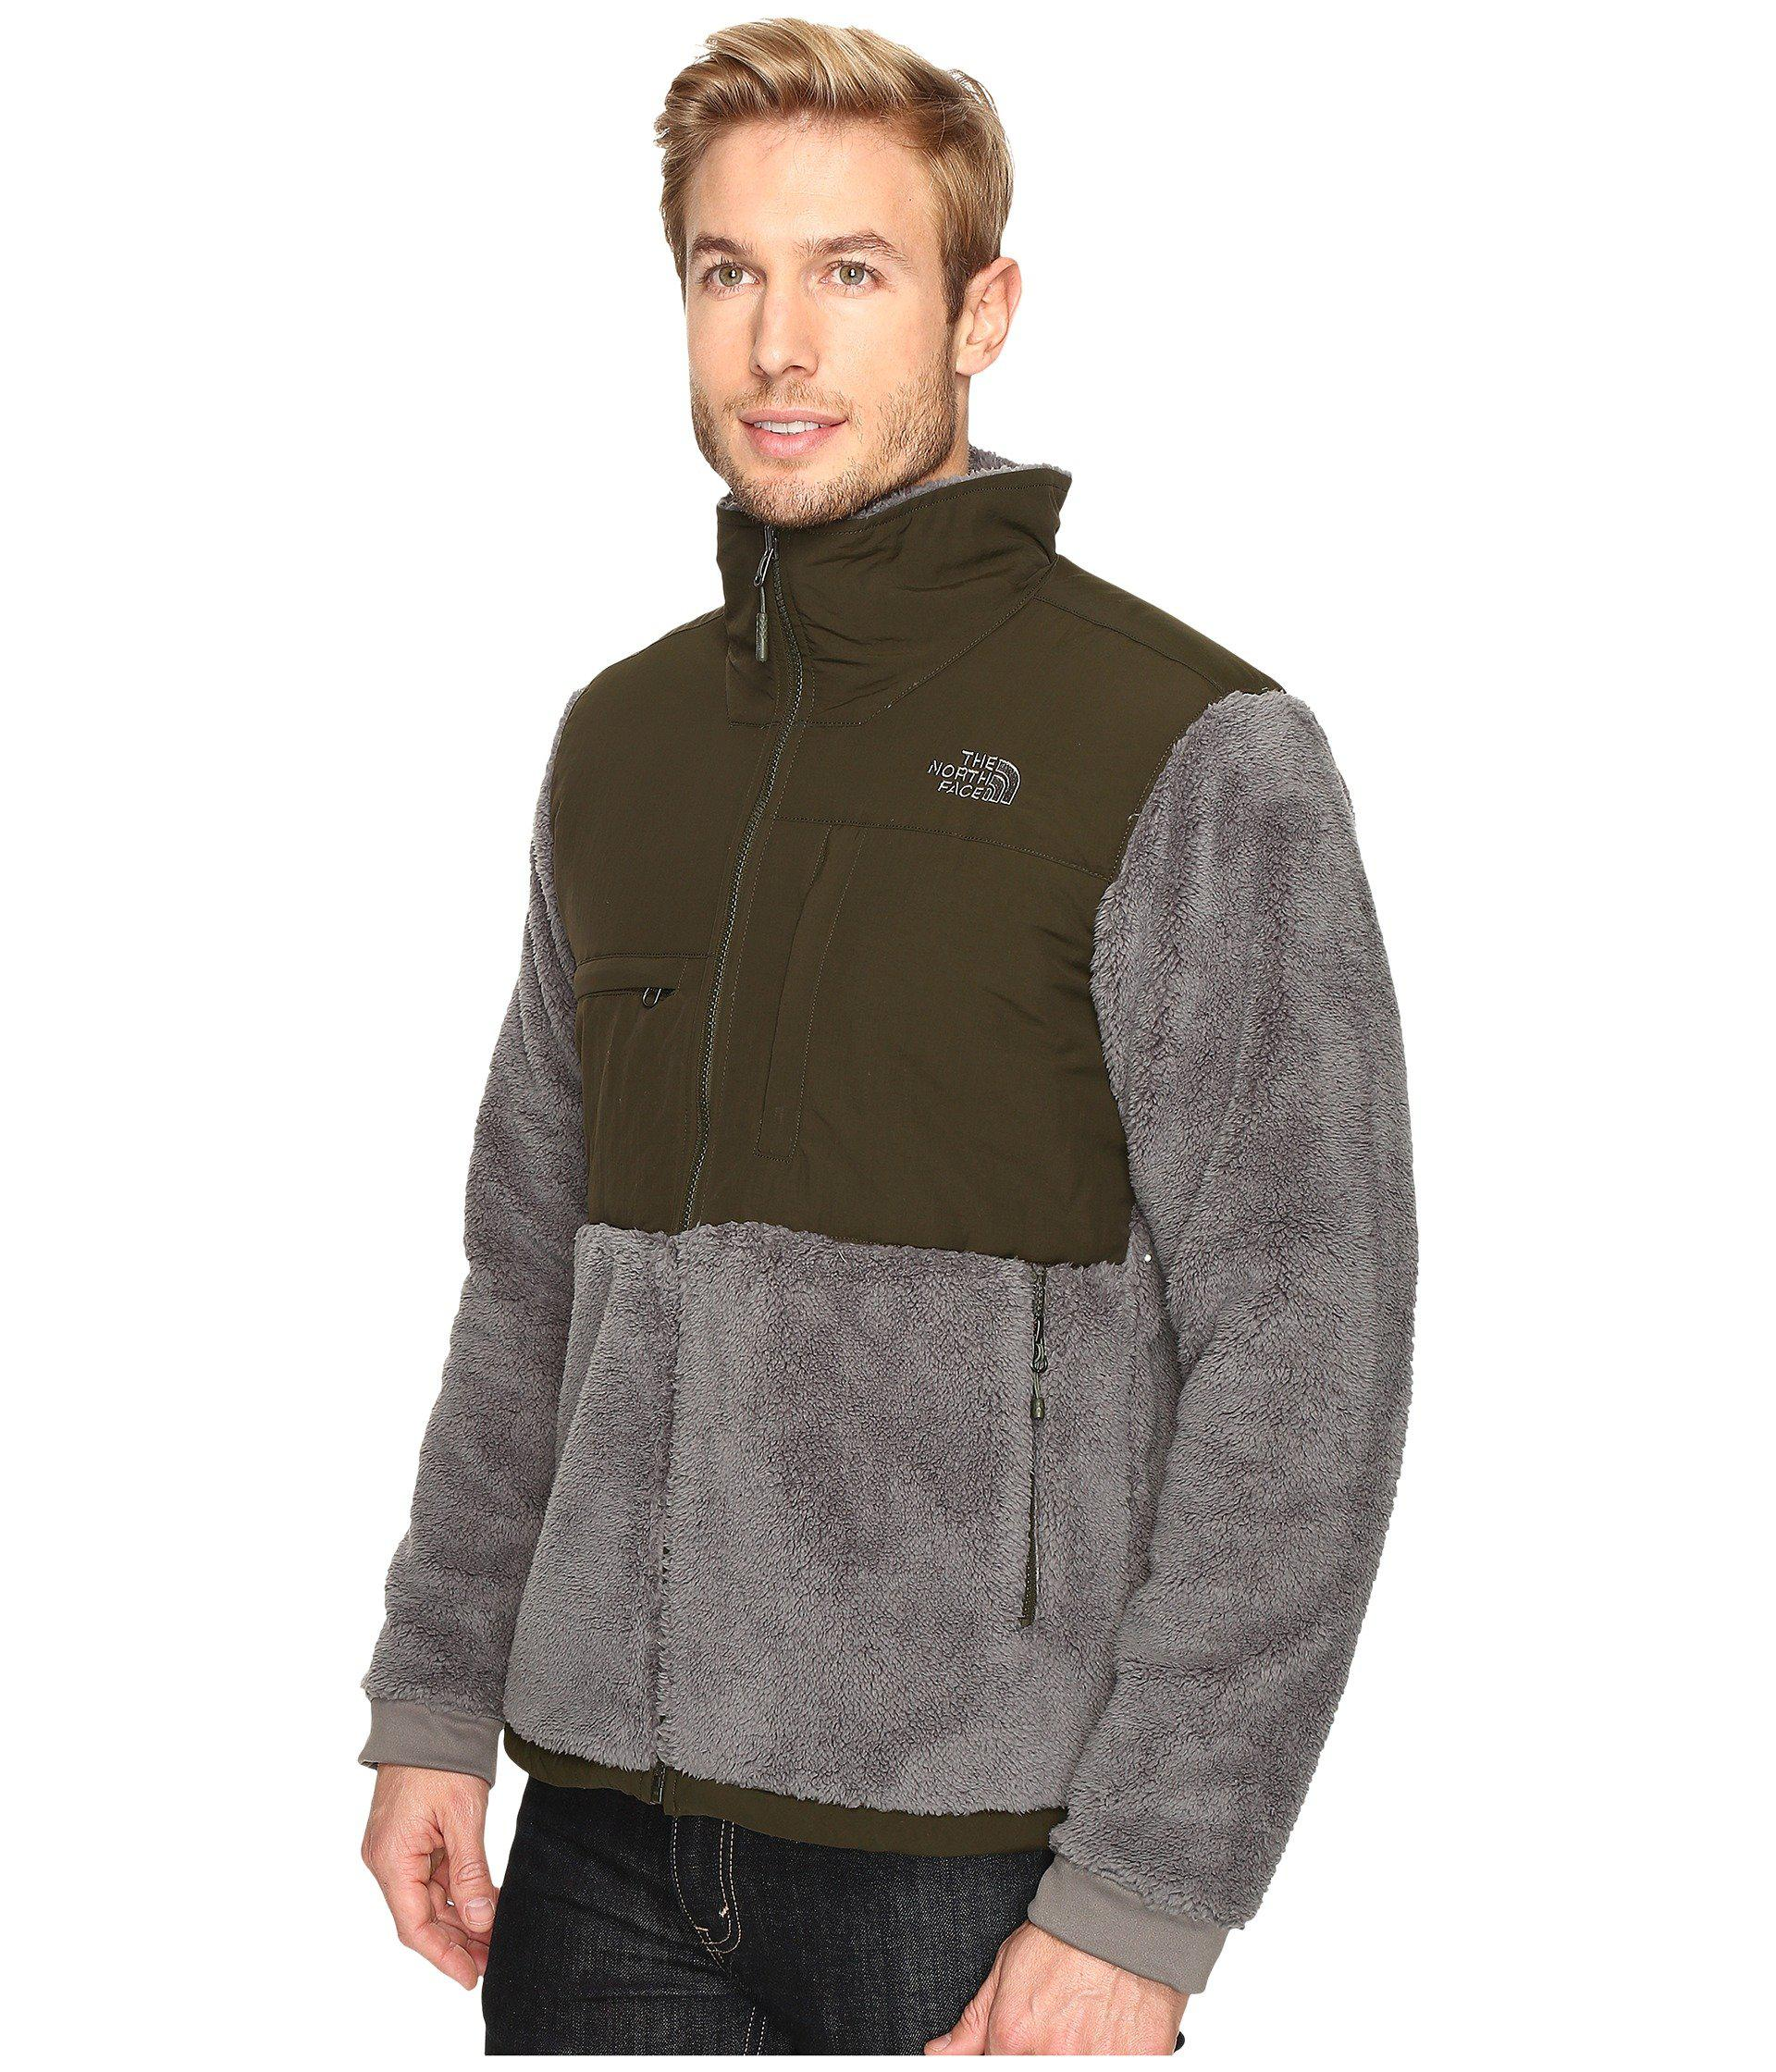 ... cheapest the north face multicolor novelty denali jacket for men lyst.  view fullscreen fd0cc 1f633 e14d46288